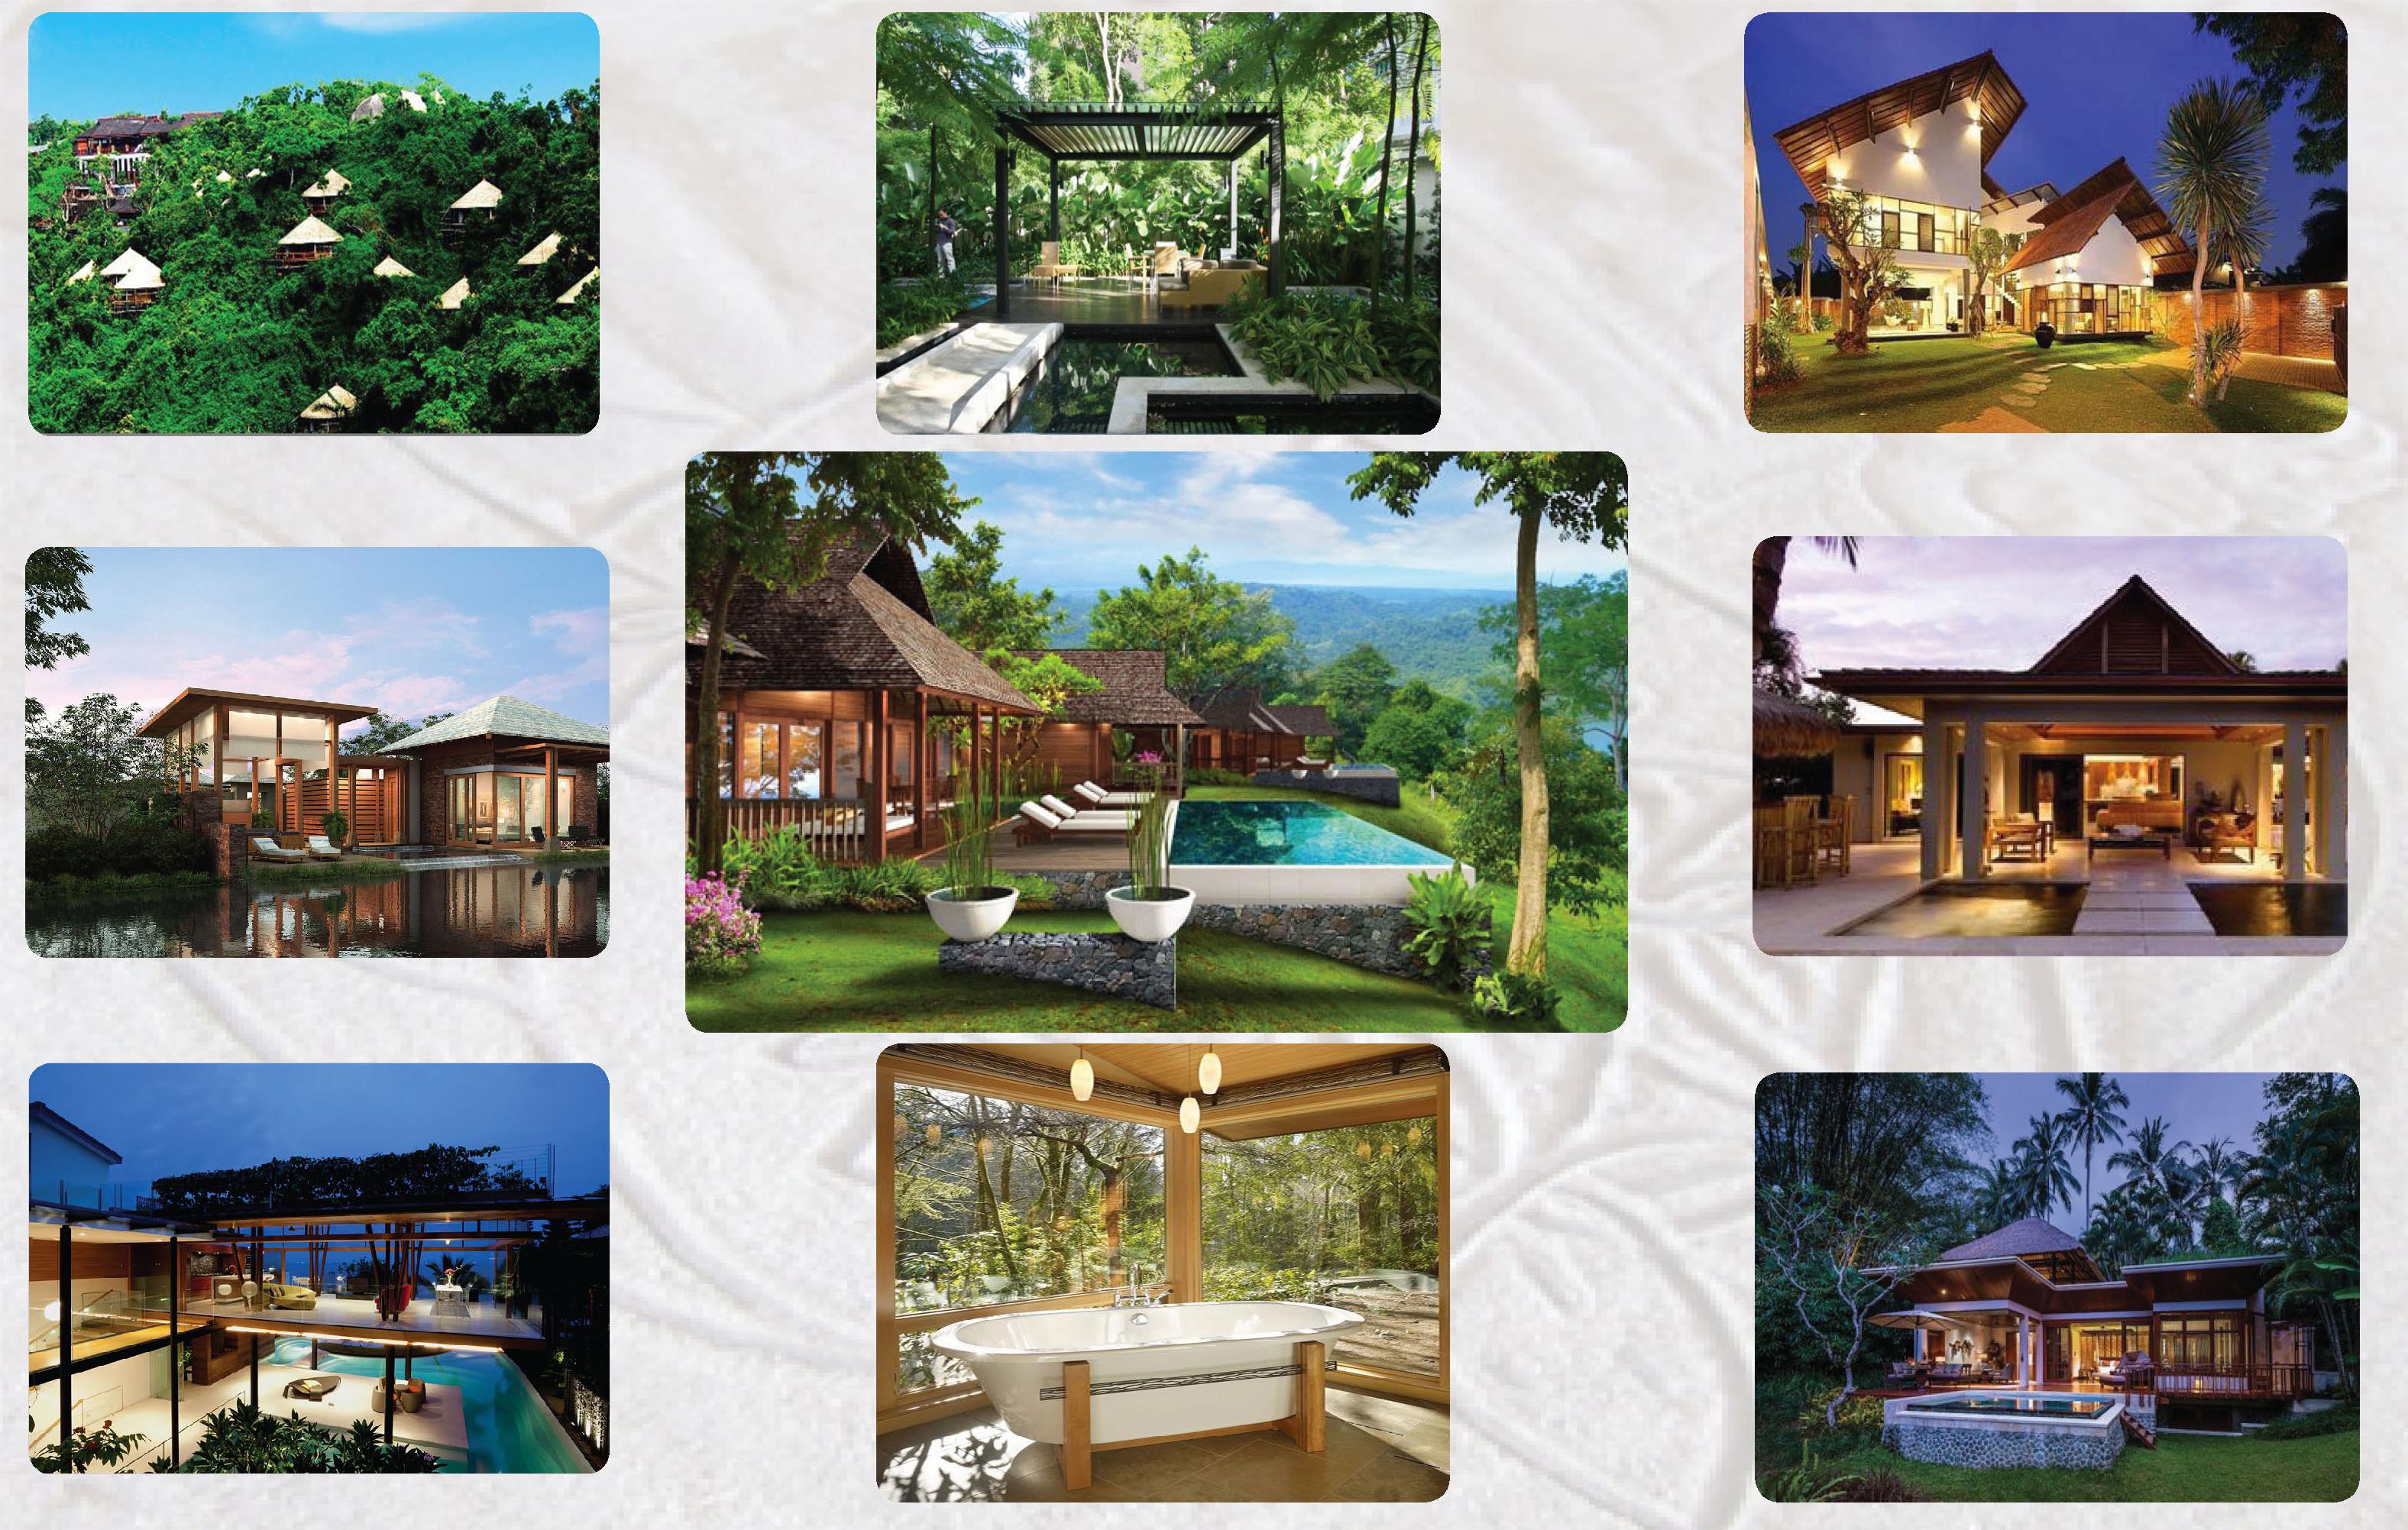 Pacific Resort & Residential Dev